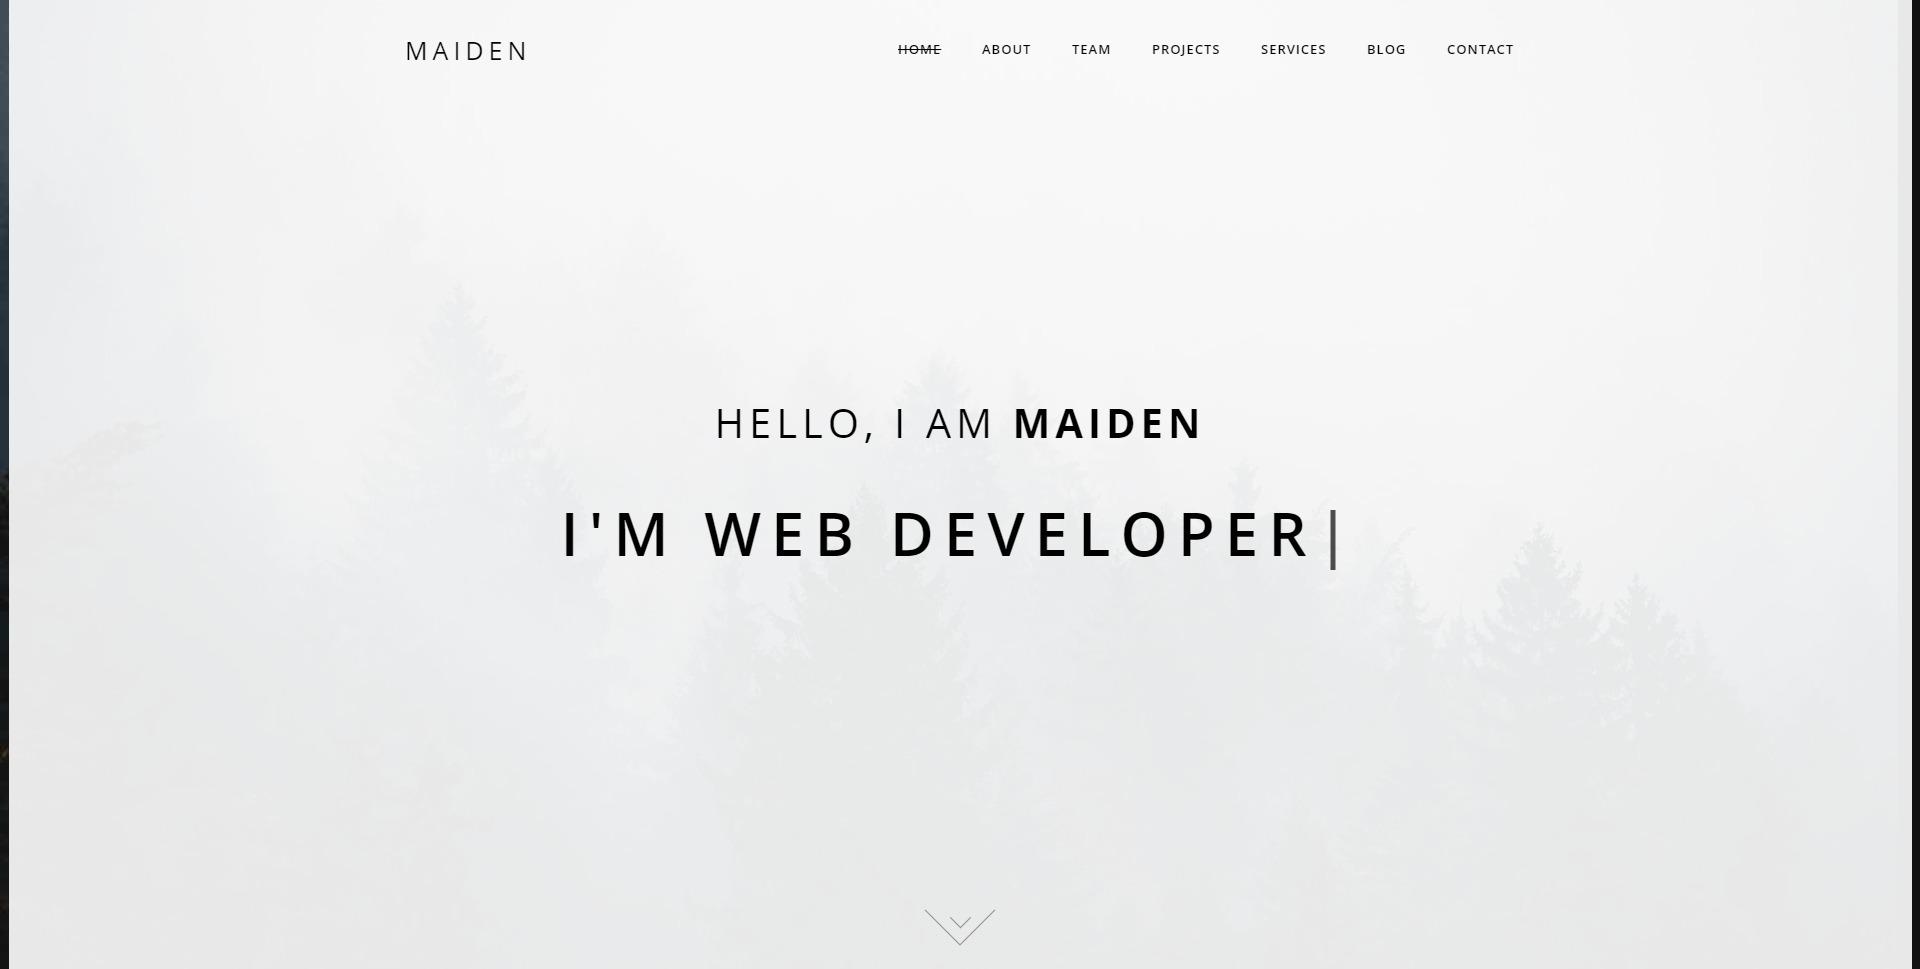 Maiden-响应式个人作品展示WordPress模板